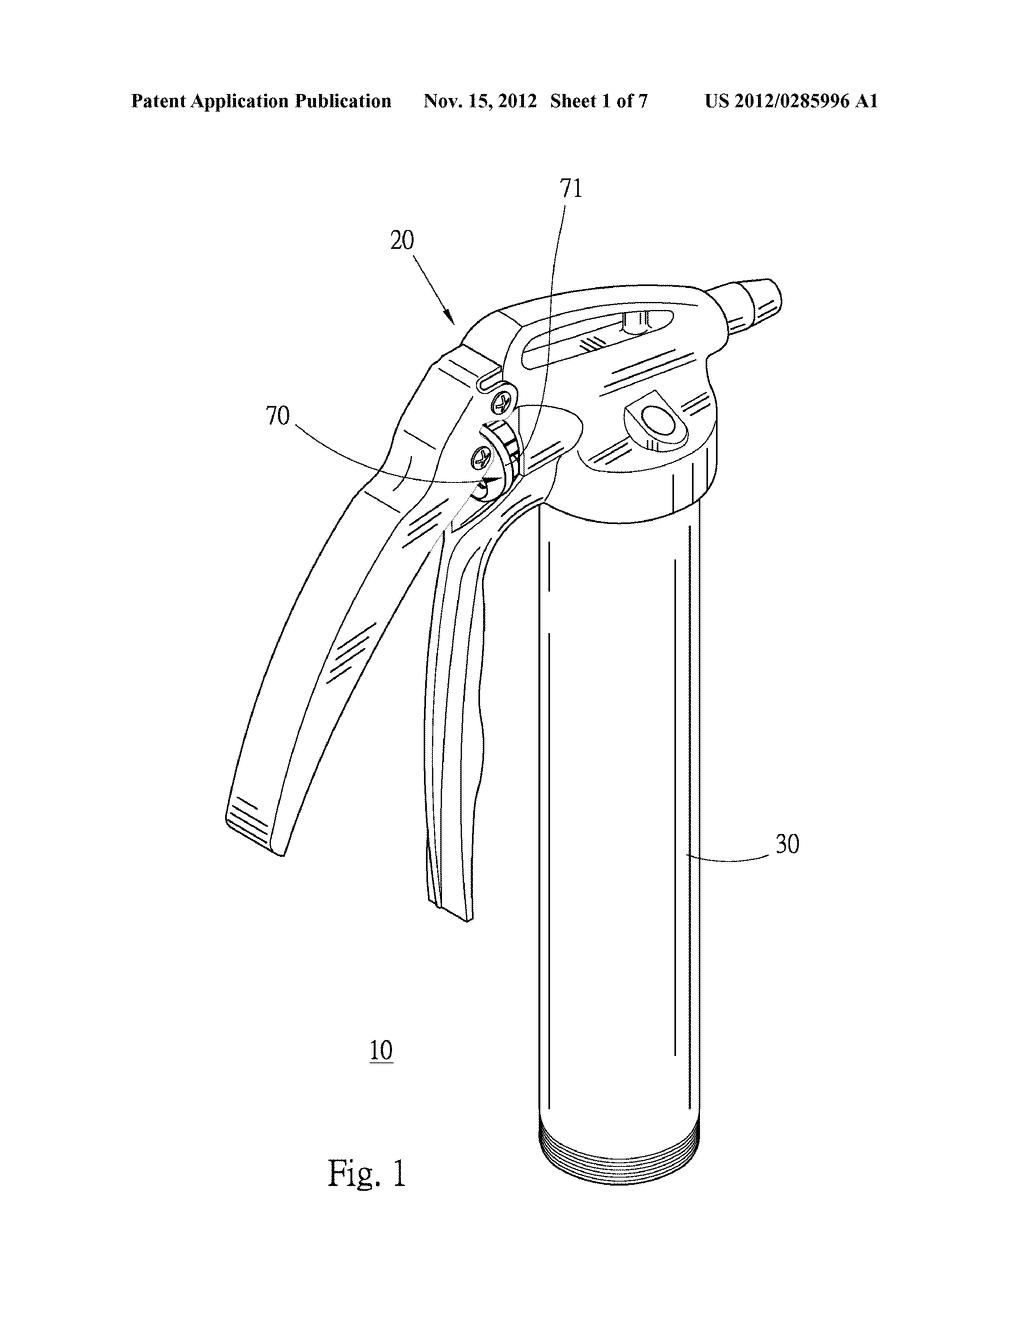 ratchet bar push structure of grease gun diagram, schematic, andratchet bar push structure of grease gun diagram, schematic, and image 02